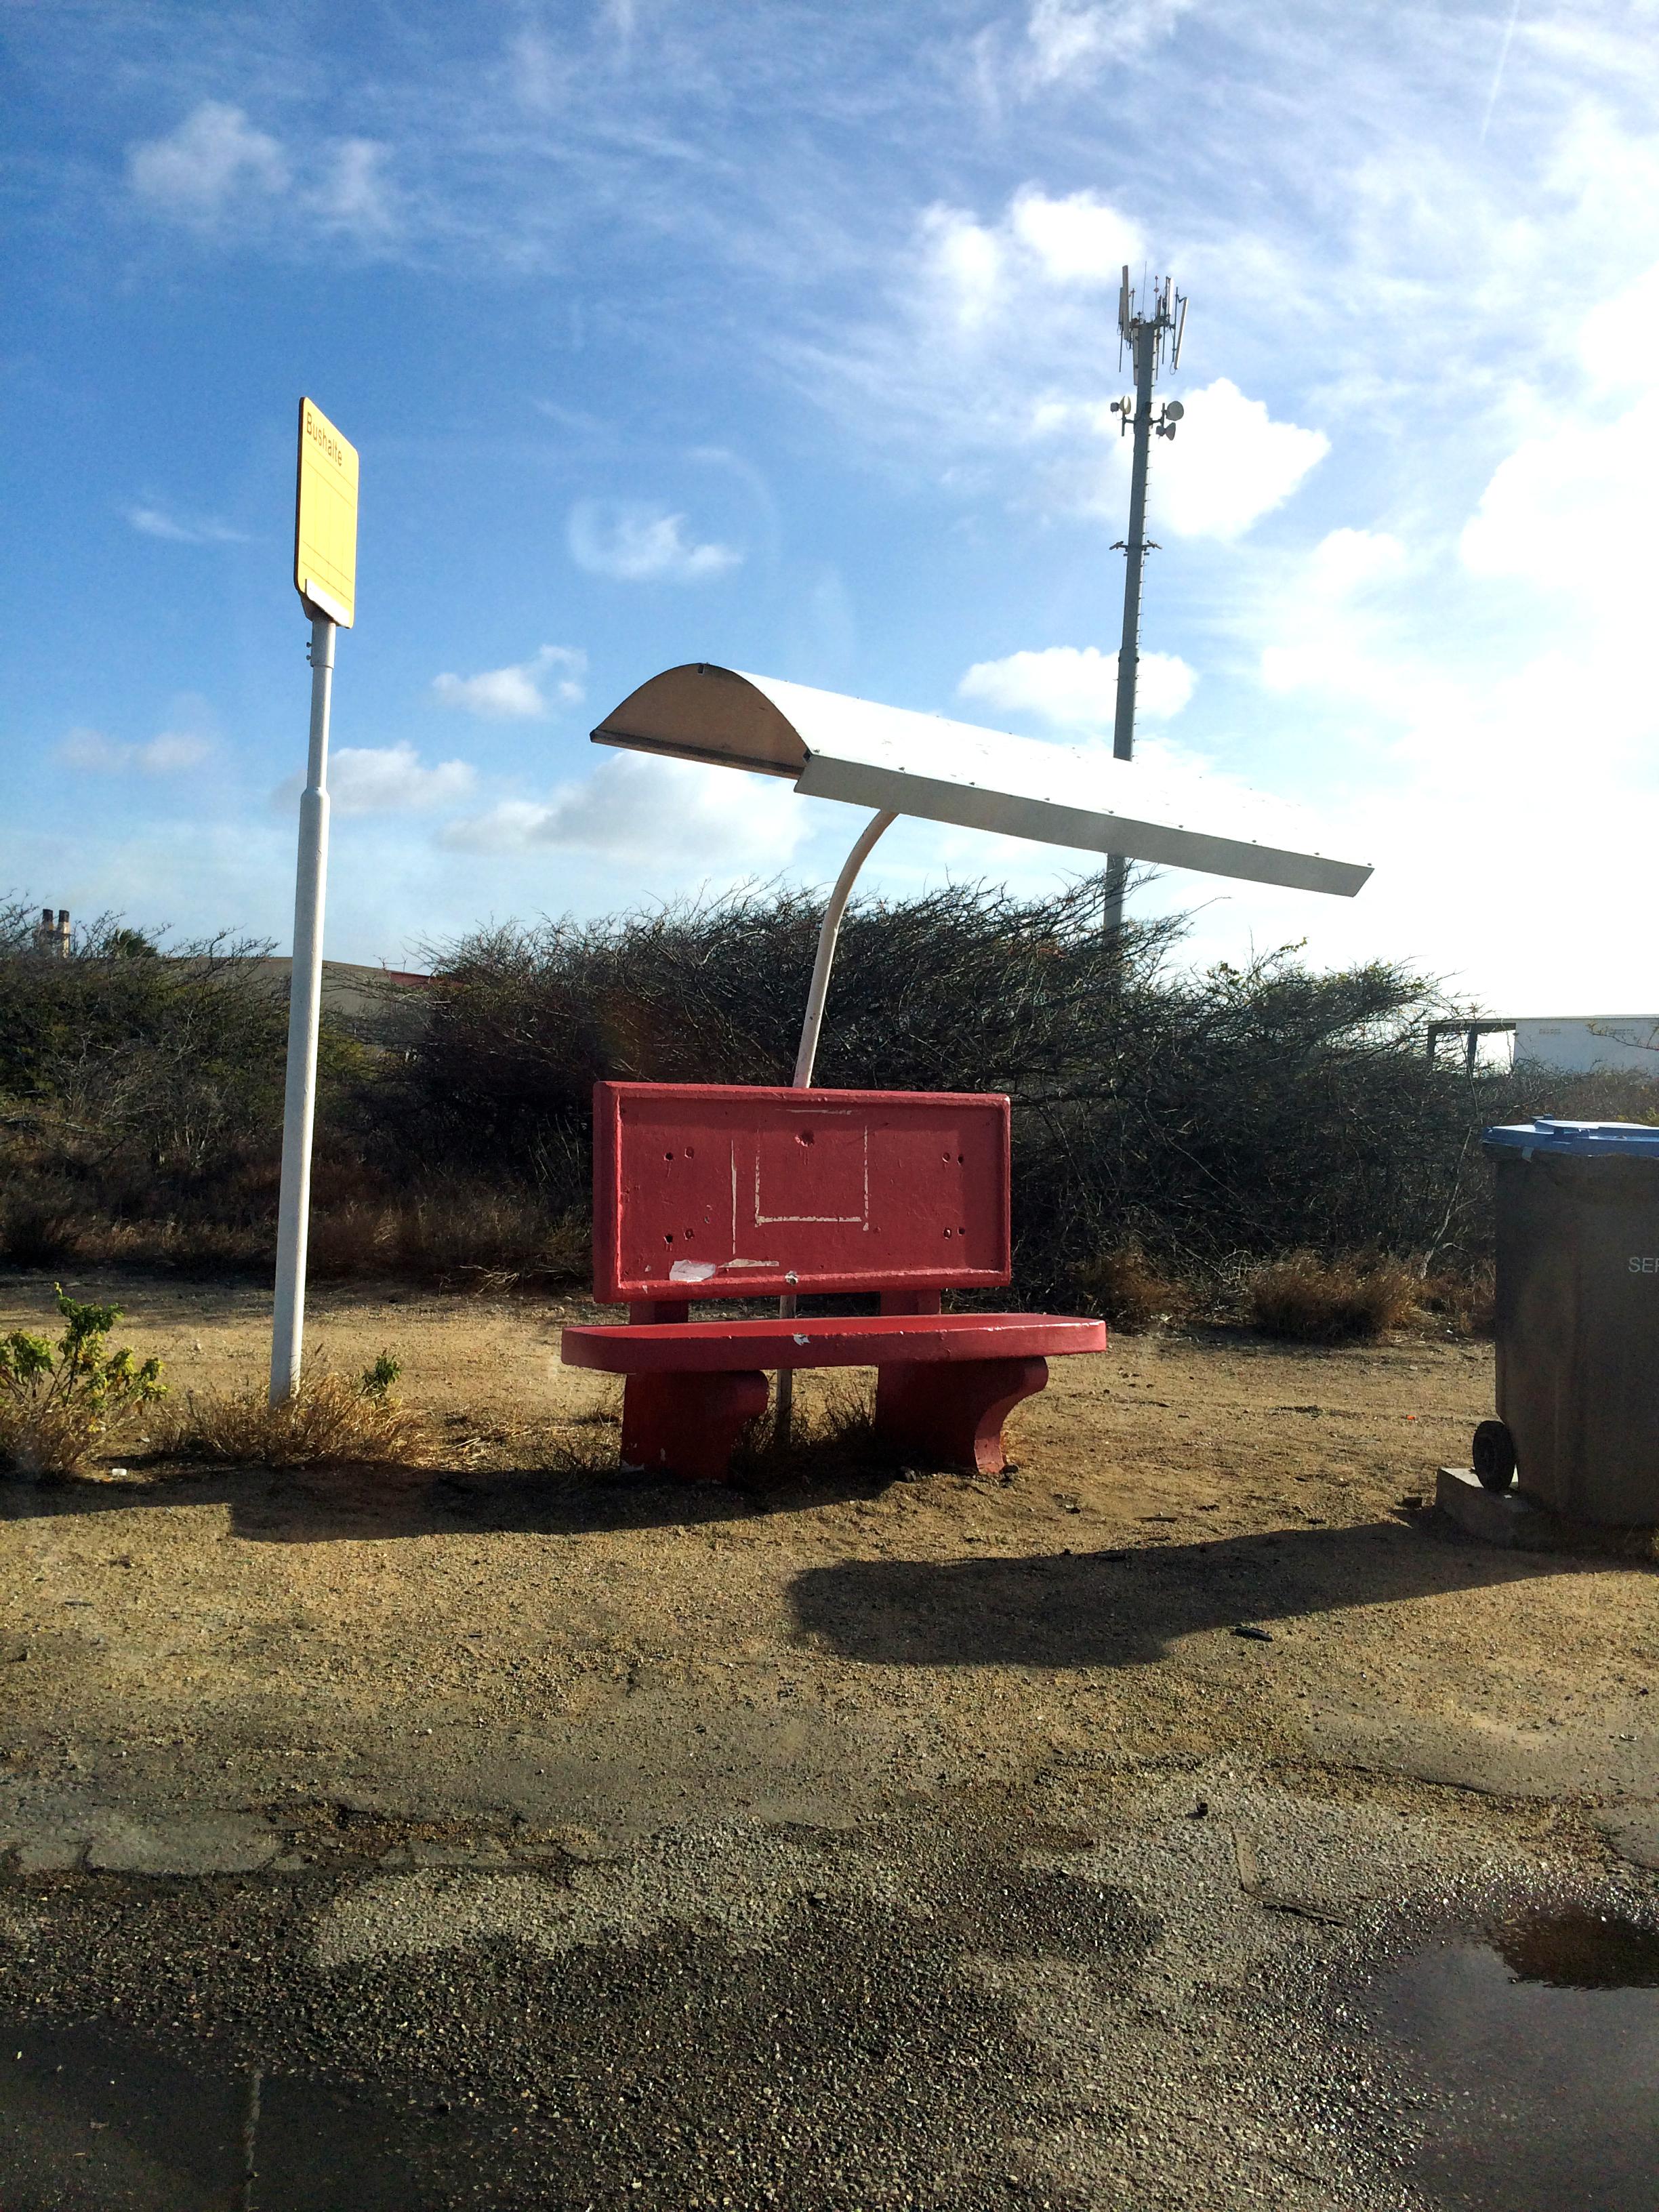 Simple bus stop in Aruba